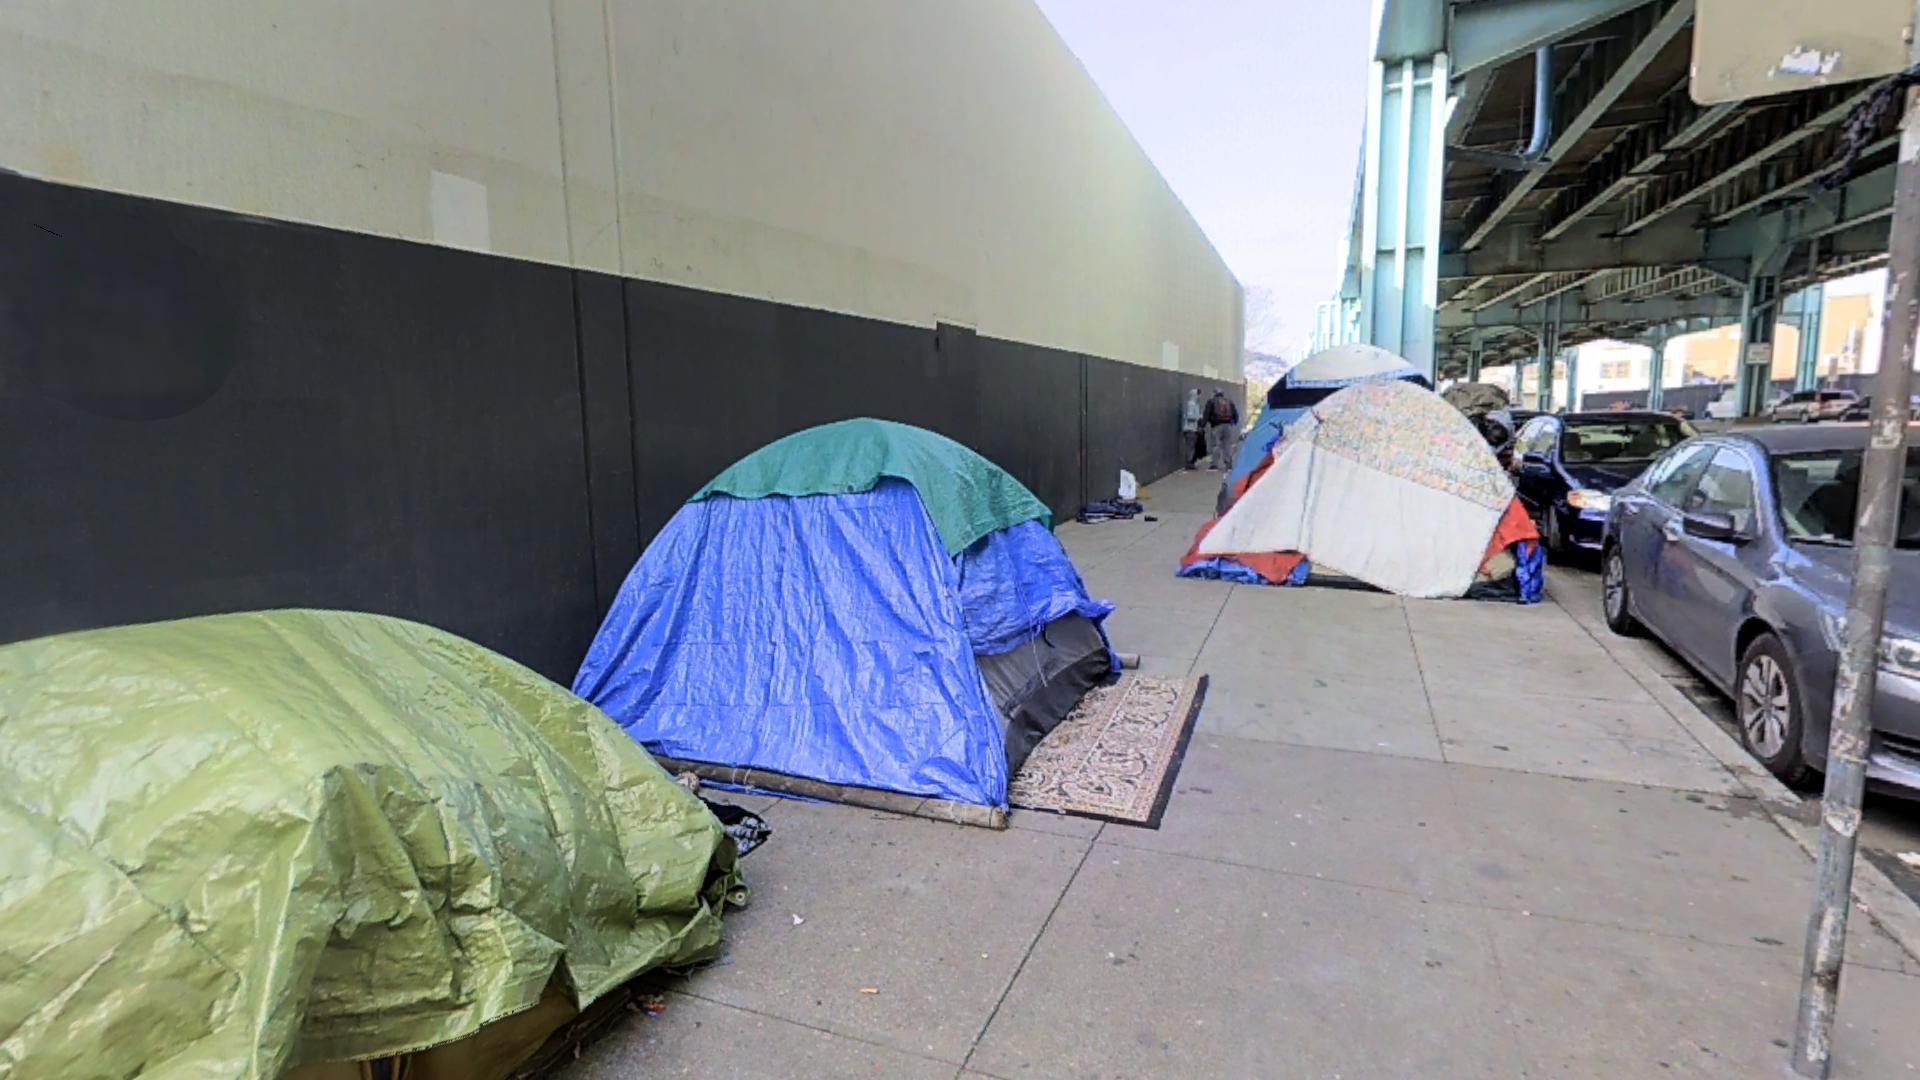 13th Street Tent City